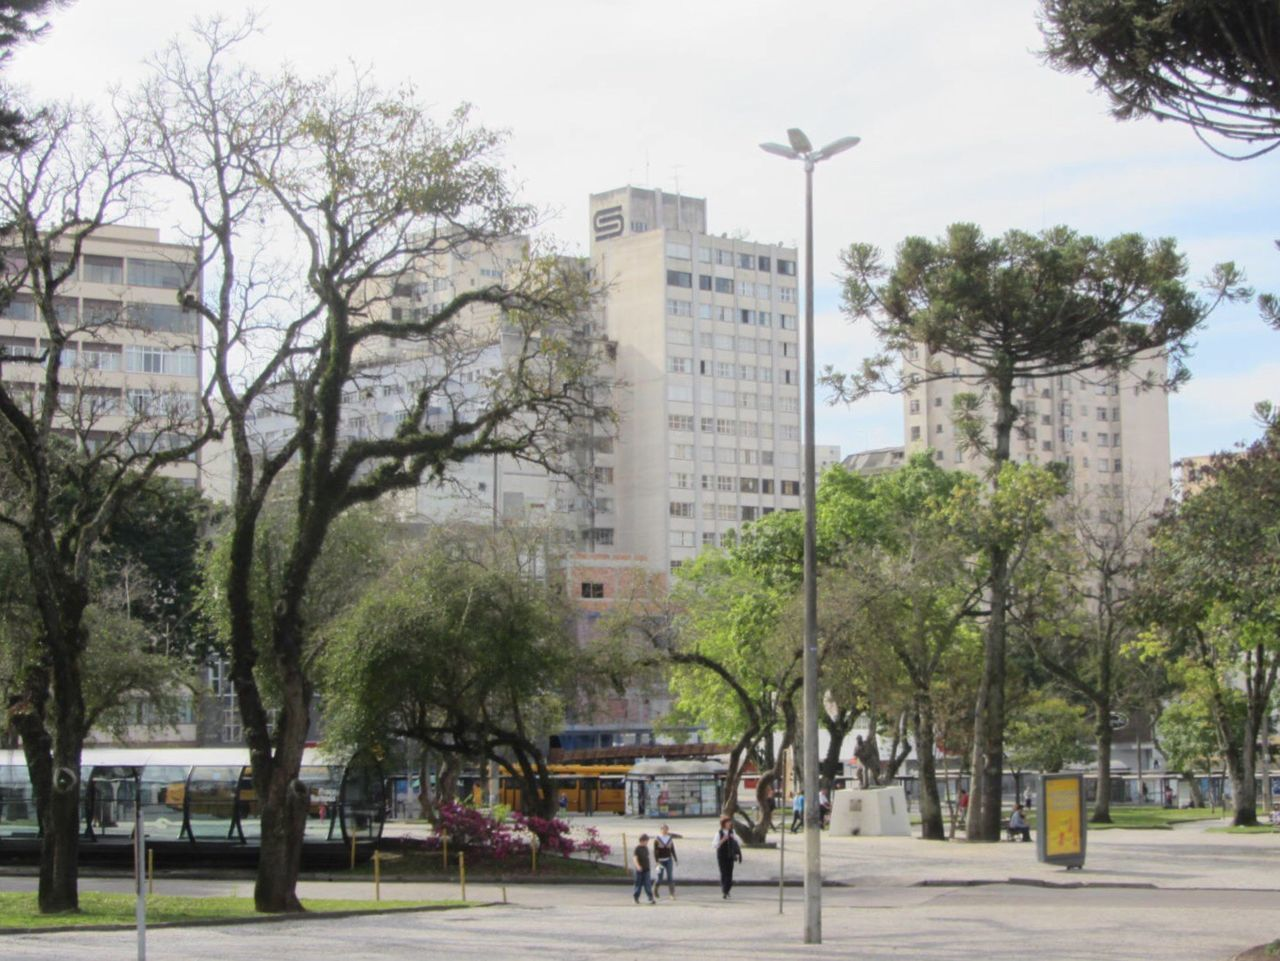 City Architecture City Life Downtown District